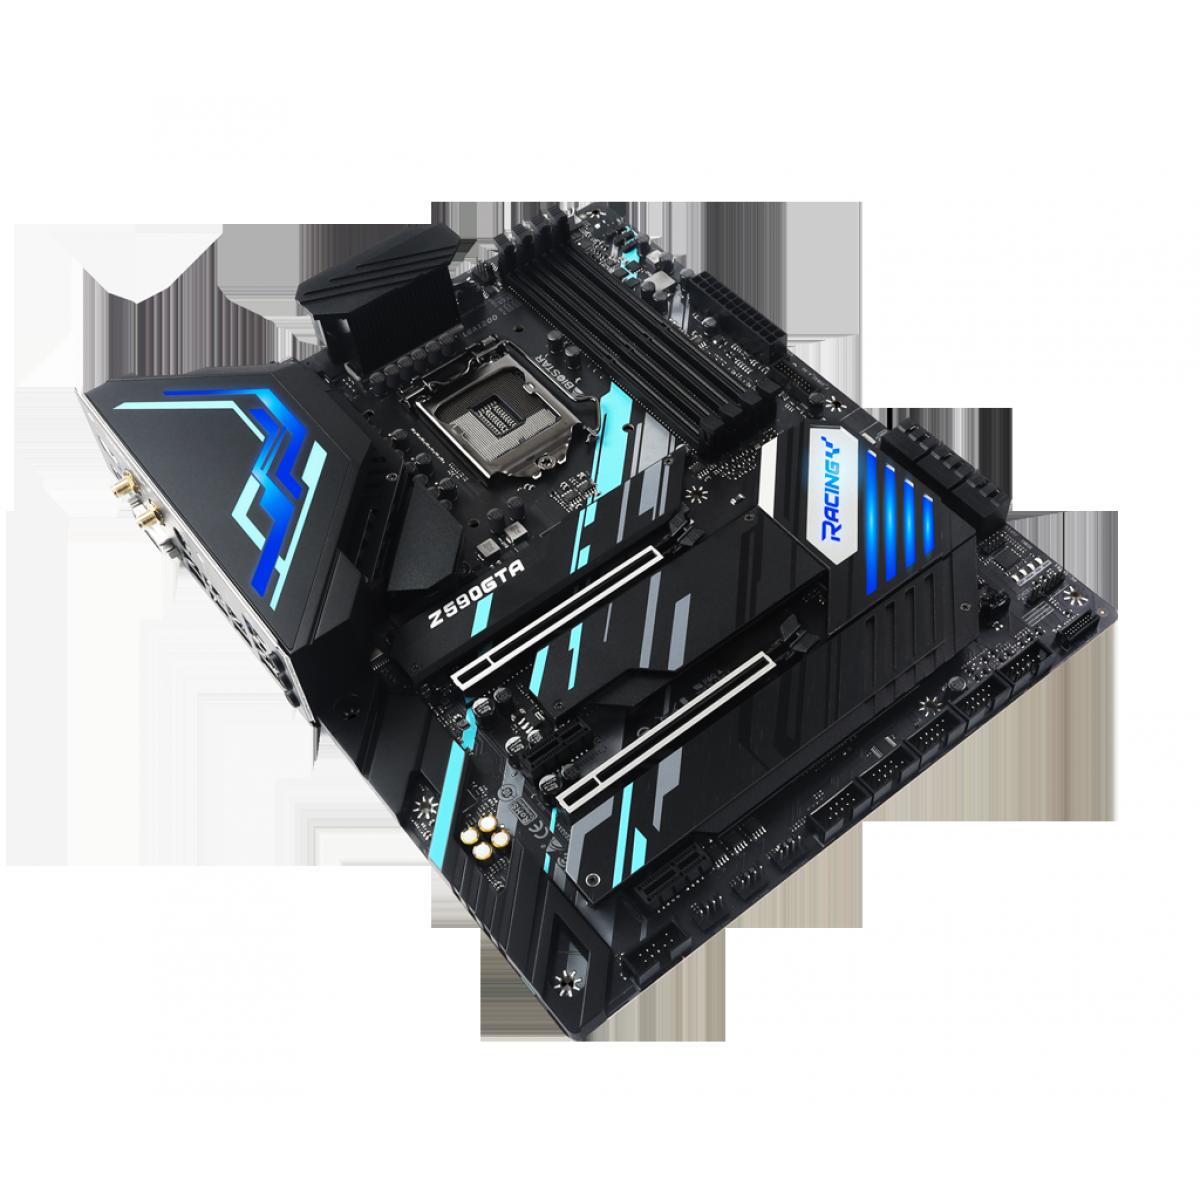 Placa Mãe BIOSTAR Z590GTA Ver. 5.0, Chipset Intel Z590, Socket 1200, ATX, DDR4